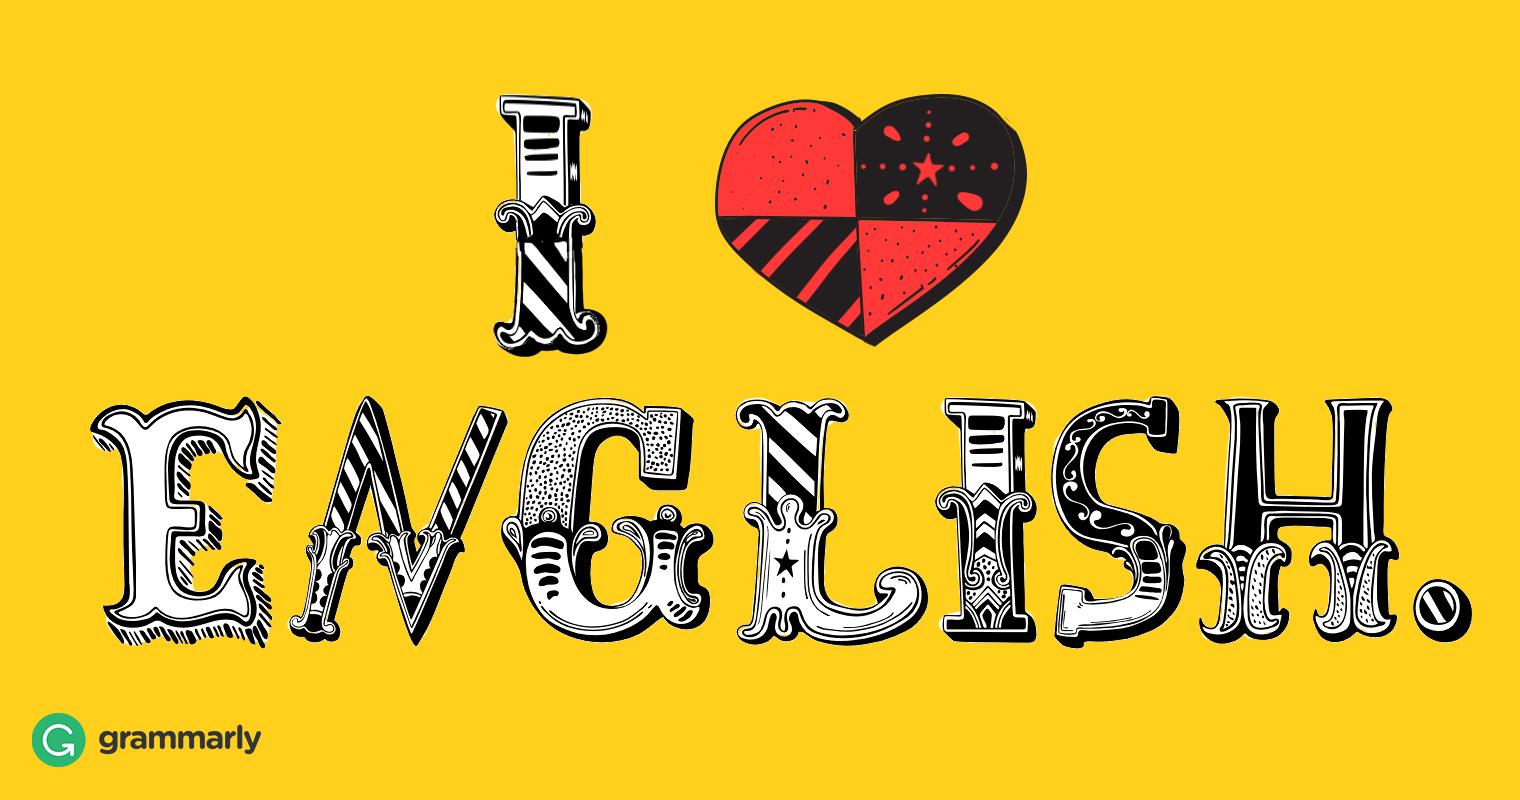 7 Reasons To Love The English Language Grammarly